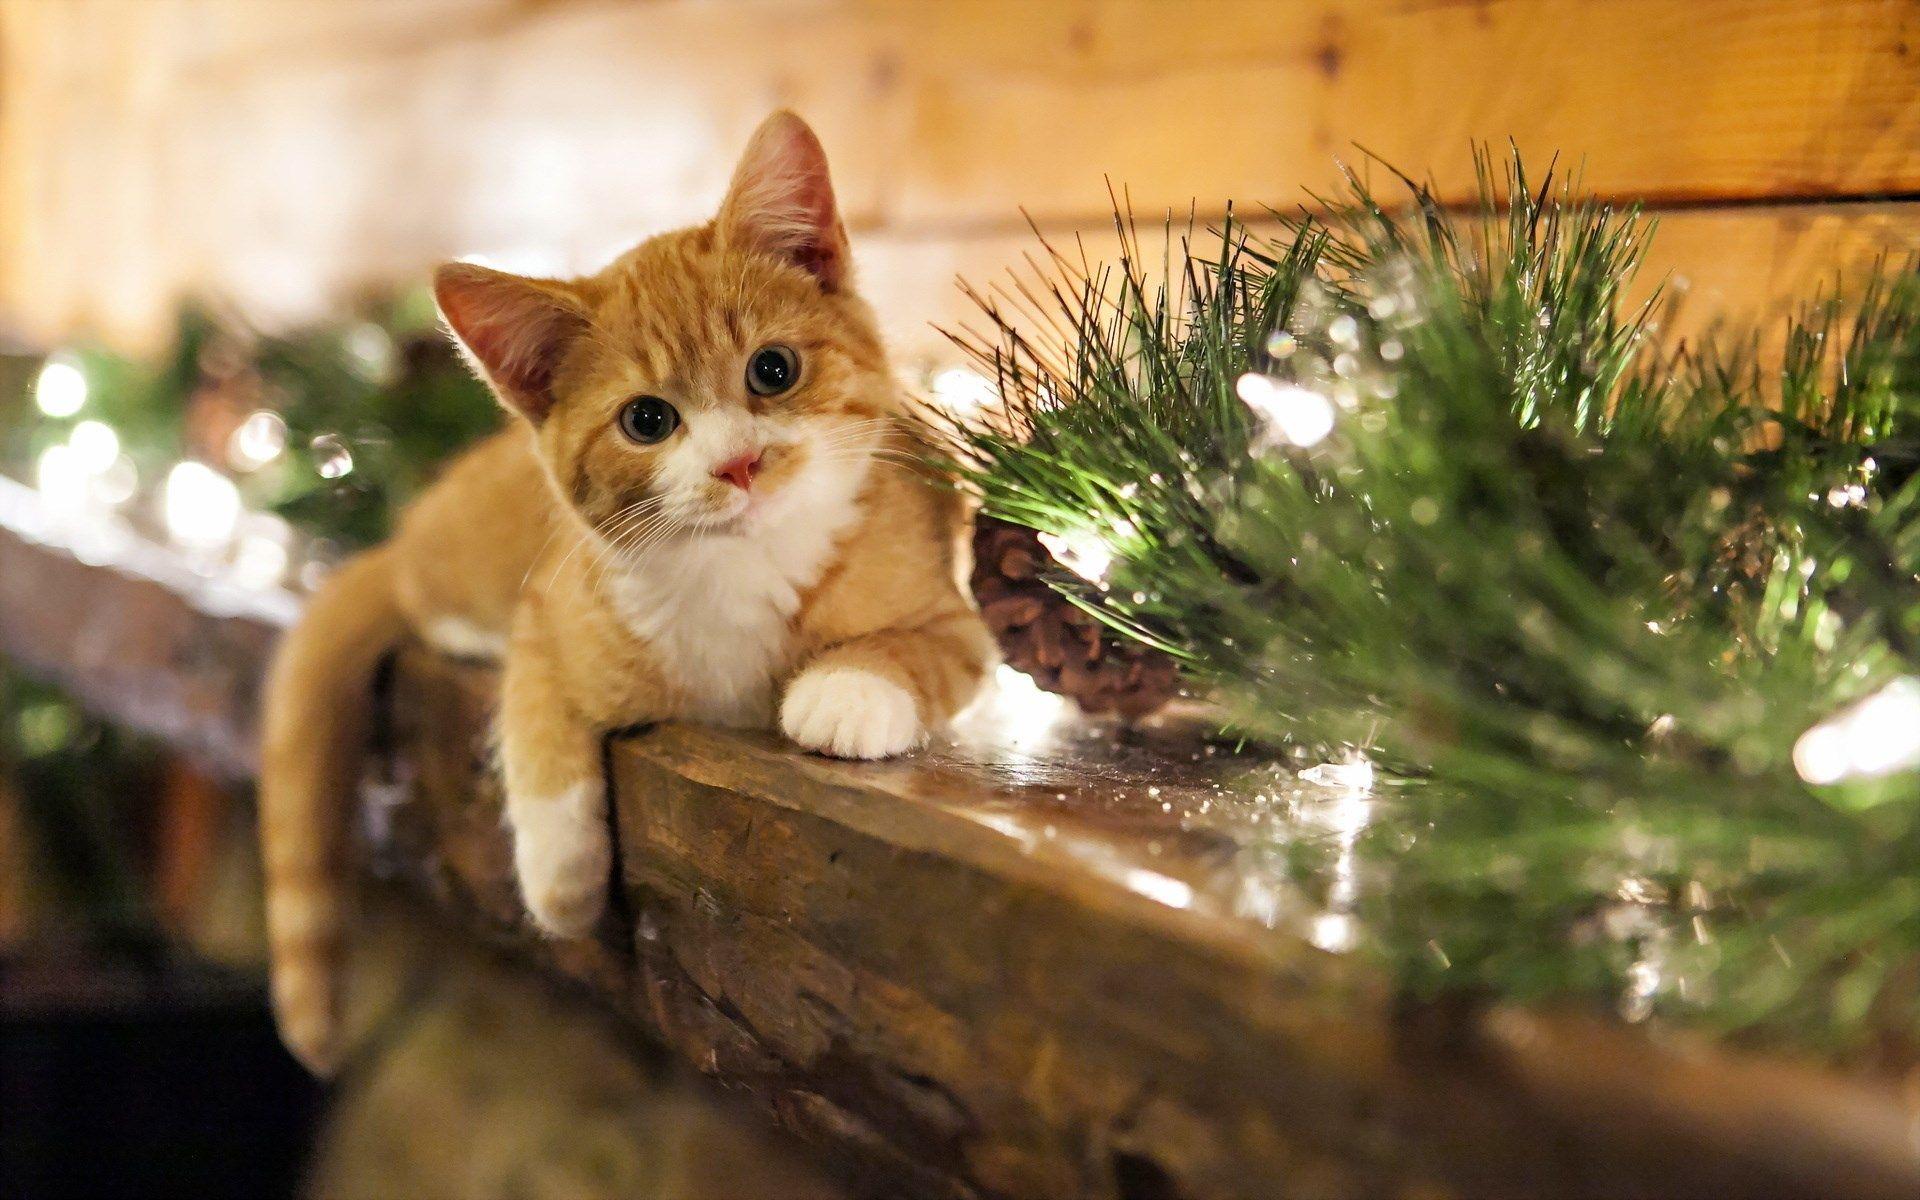 christmas lights cat wallpaper - Google Search | Cats | Cats ...